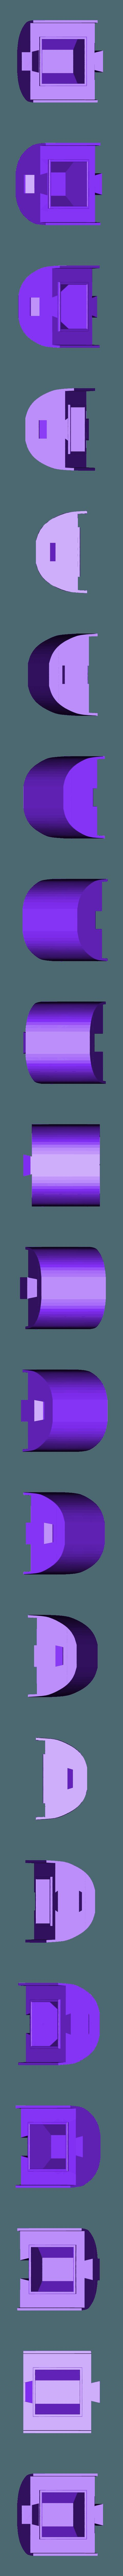 cas_modular_middle.stl Download free STL file CAS - the modular xyz-cube cargo ship • 3D printing template, vandragon_de